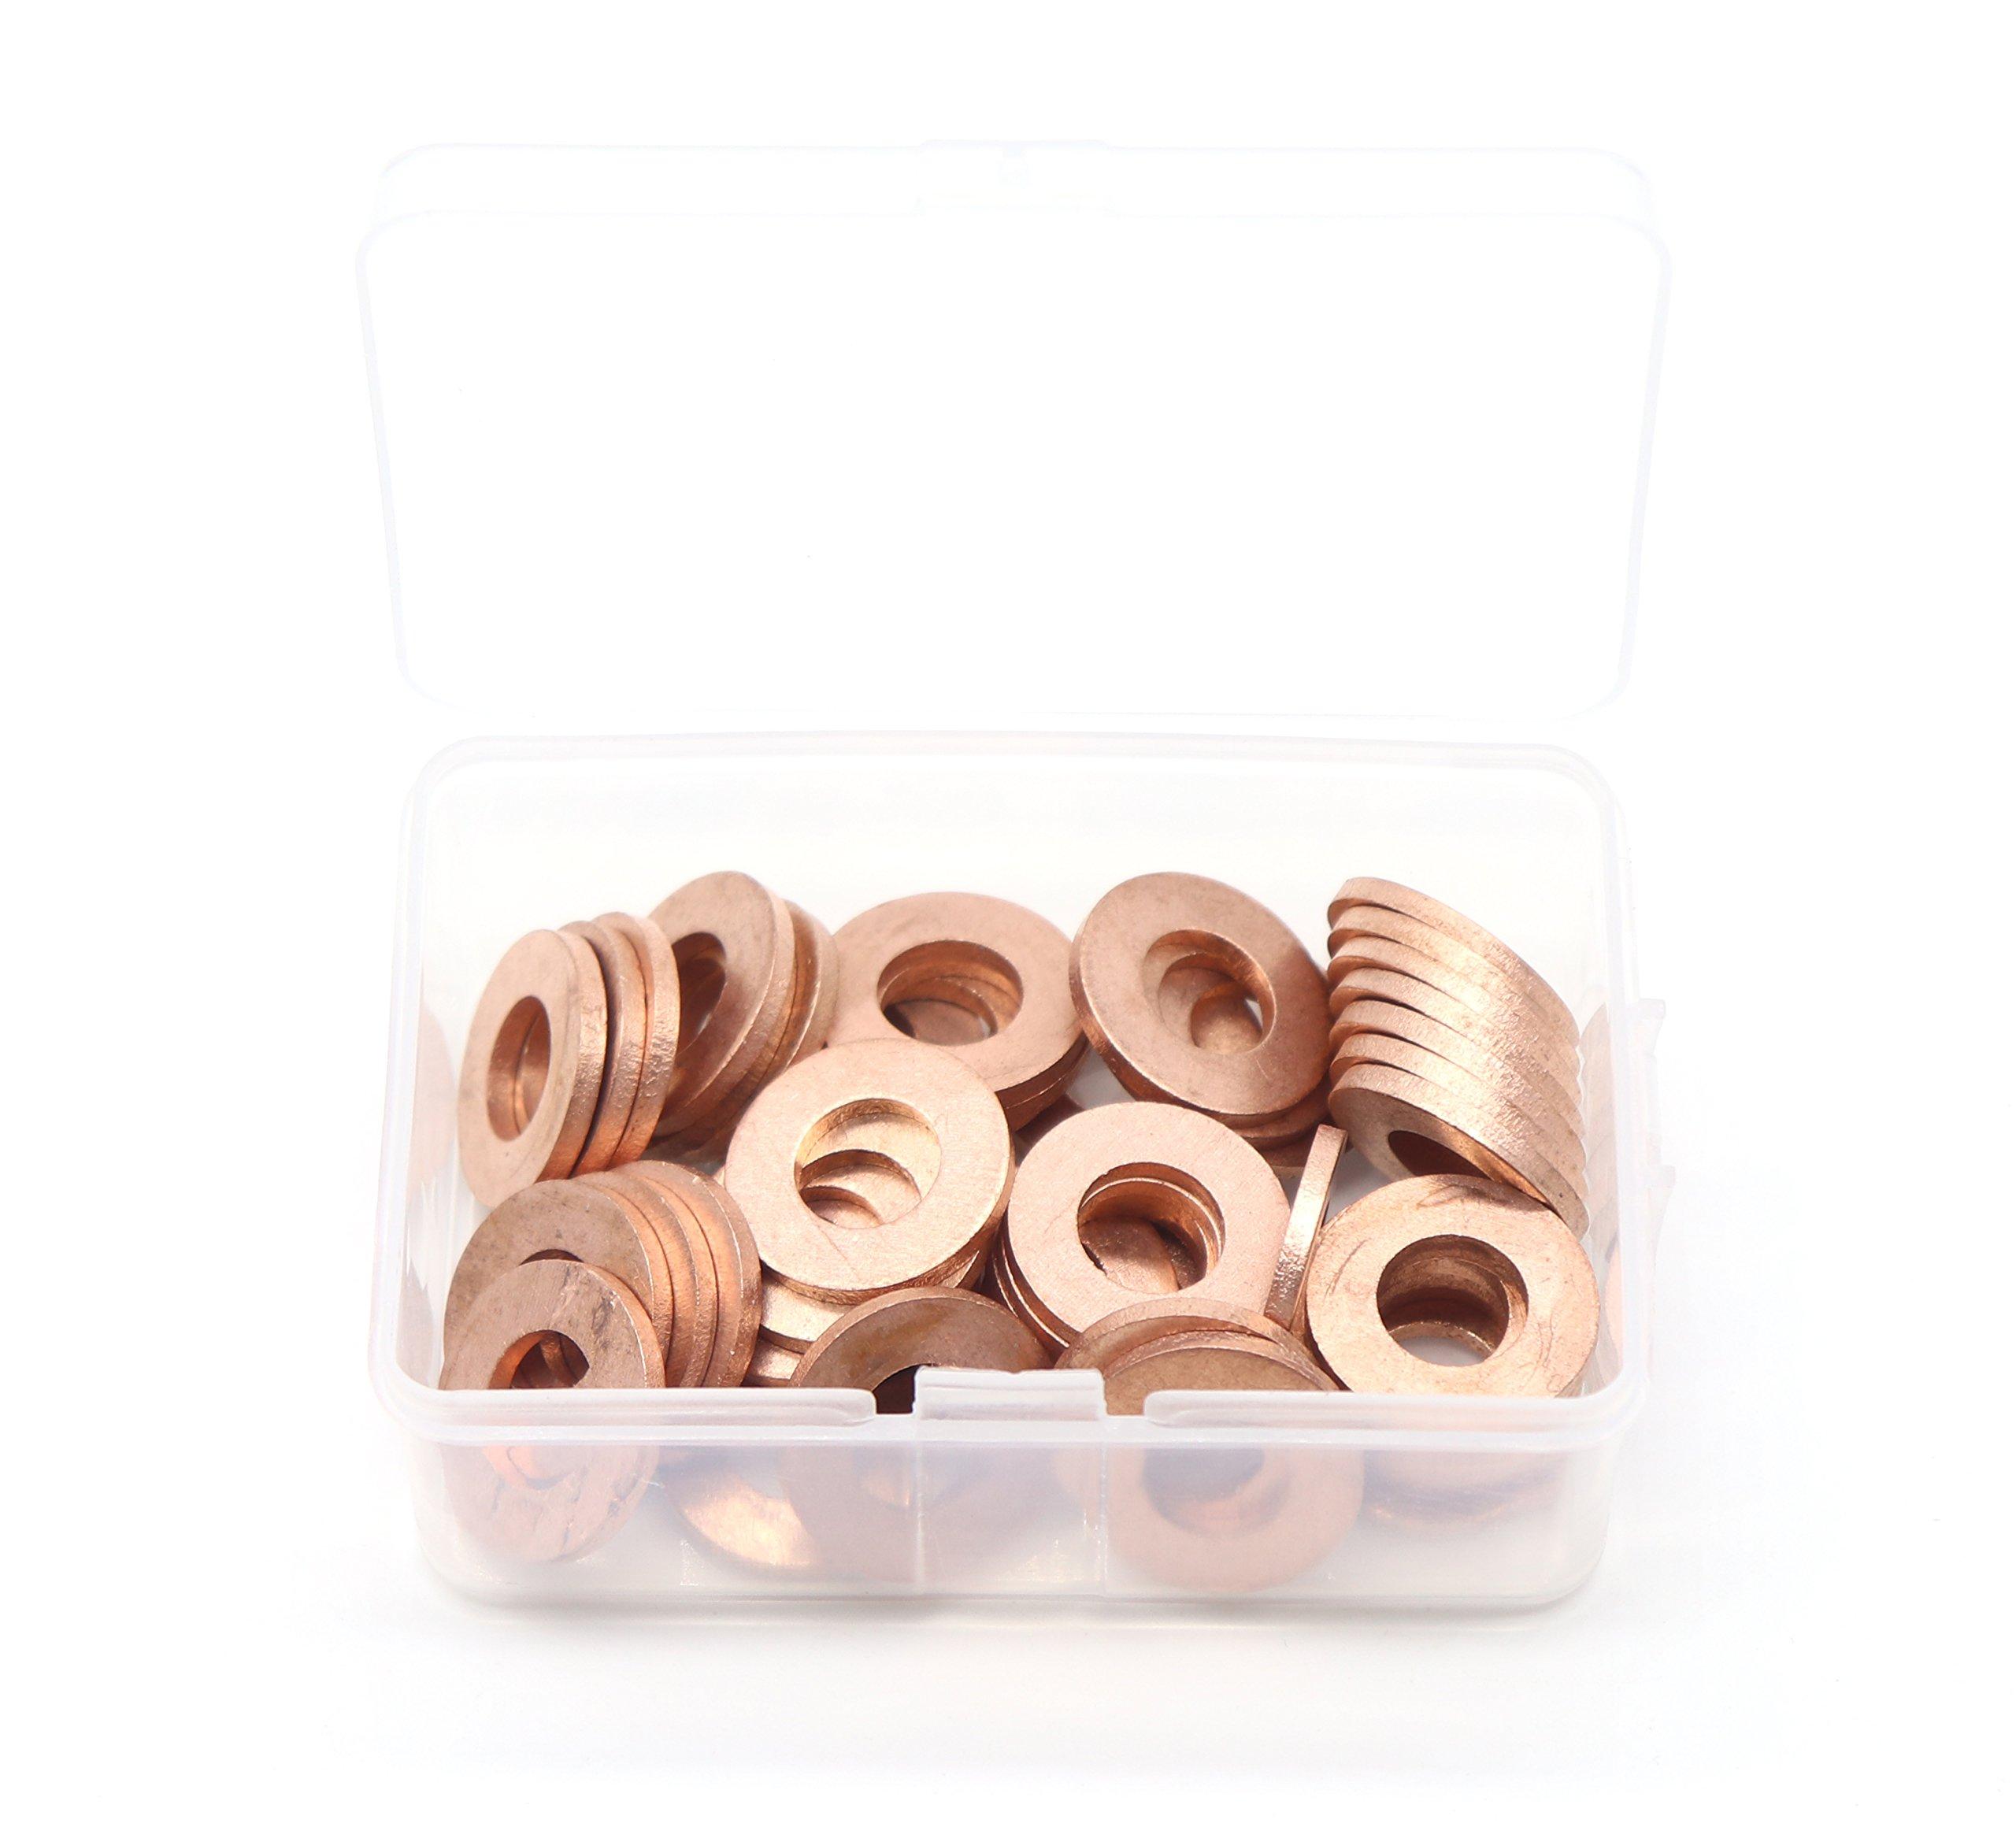 binifiMux 50-Pack M10 x 20 x 2mm Metric Flat Copper Sealing Washers by binifiMux (Image #1)